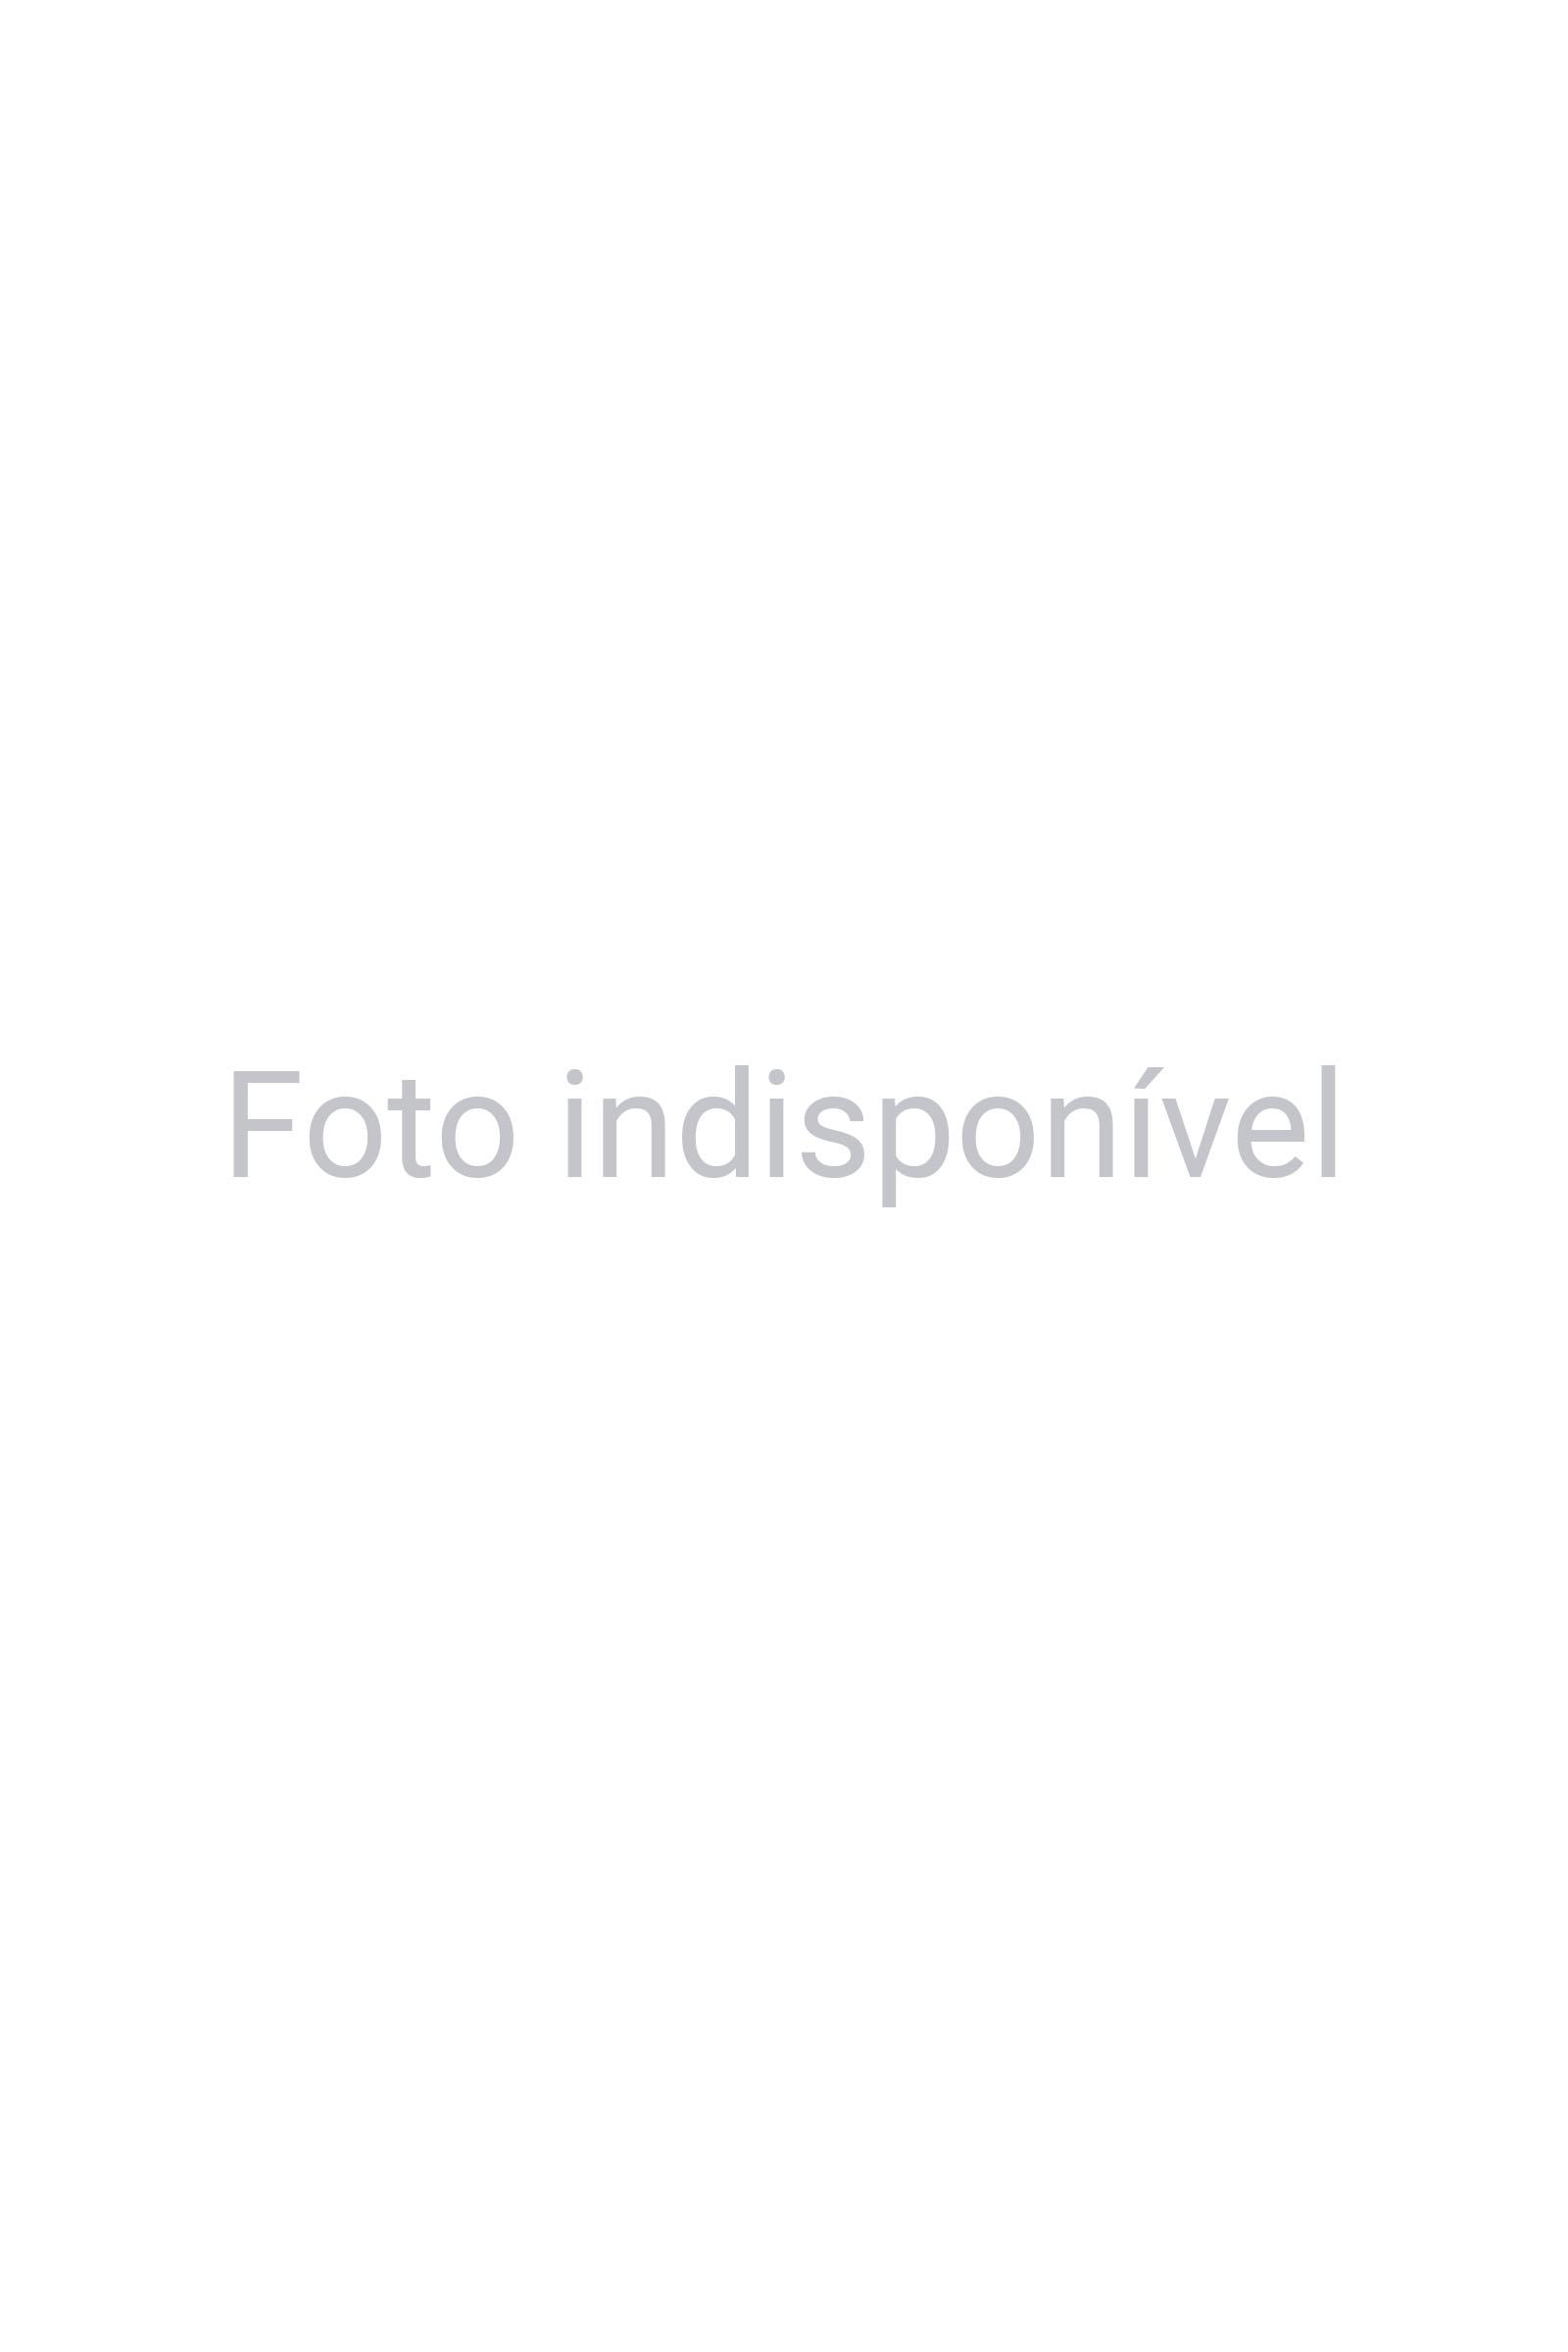 Top Infinity Laranja Flour, Coleção You can - NKT Fitwear Moda Fitness